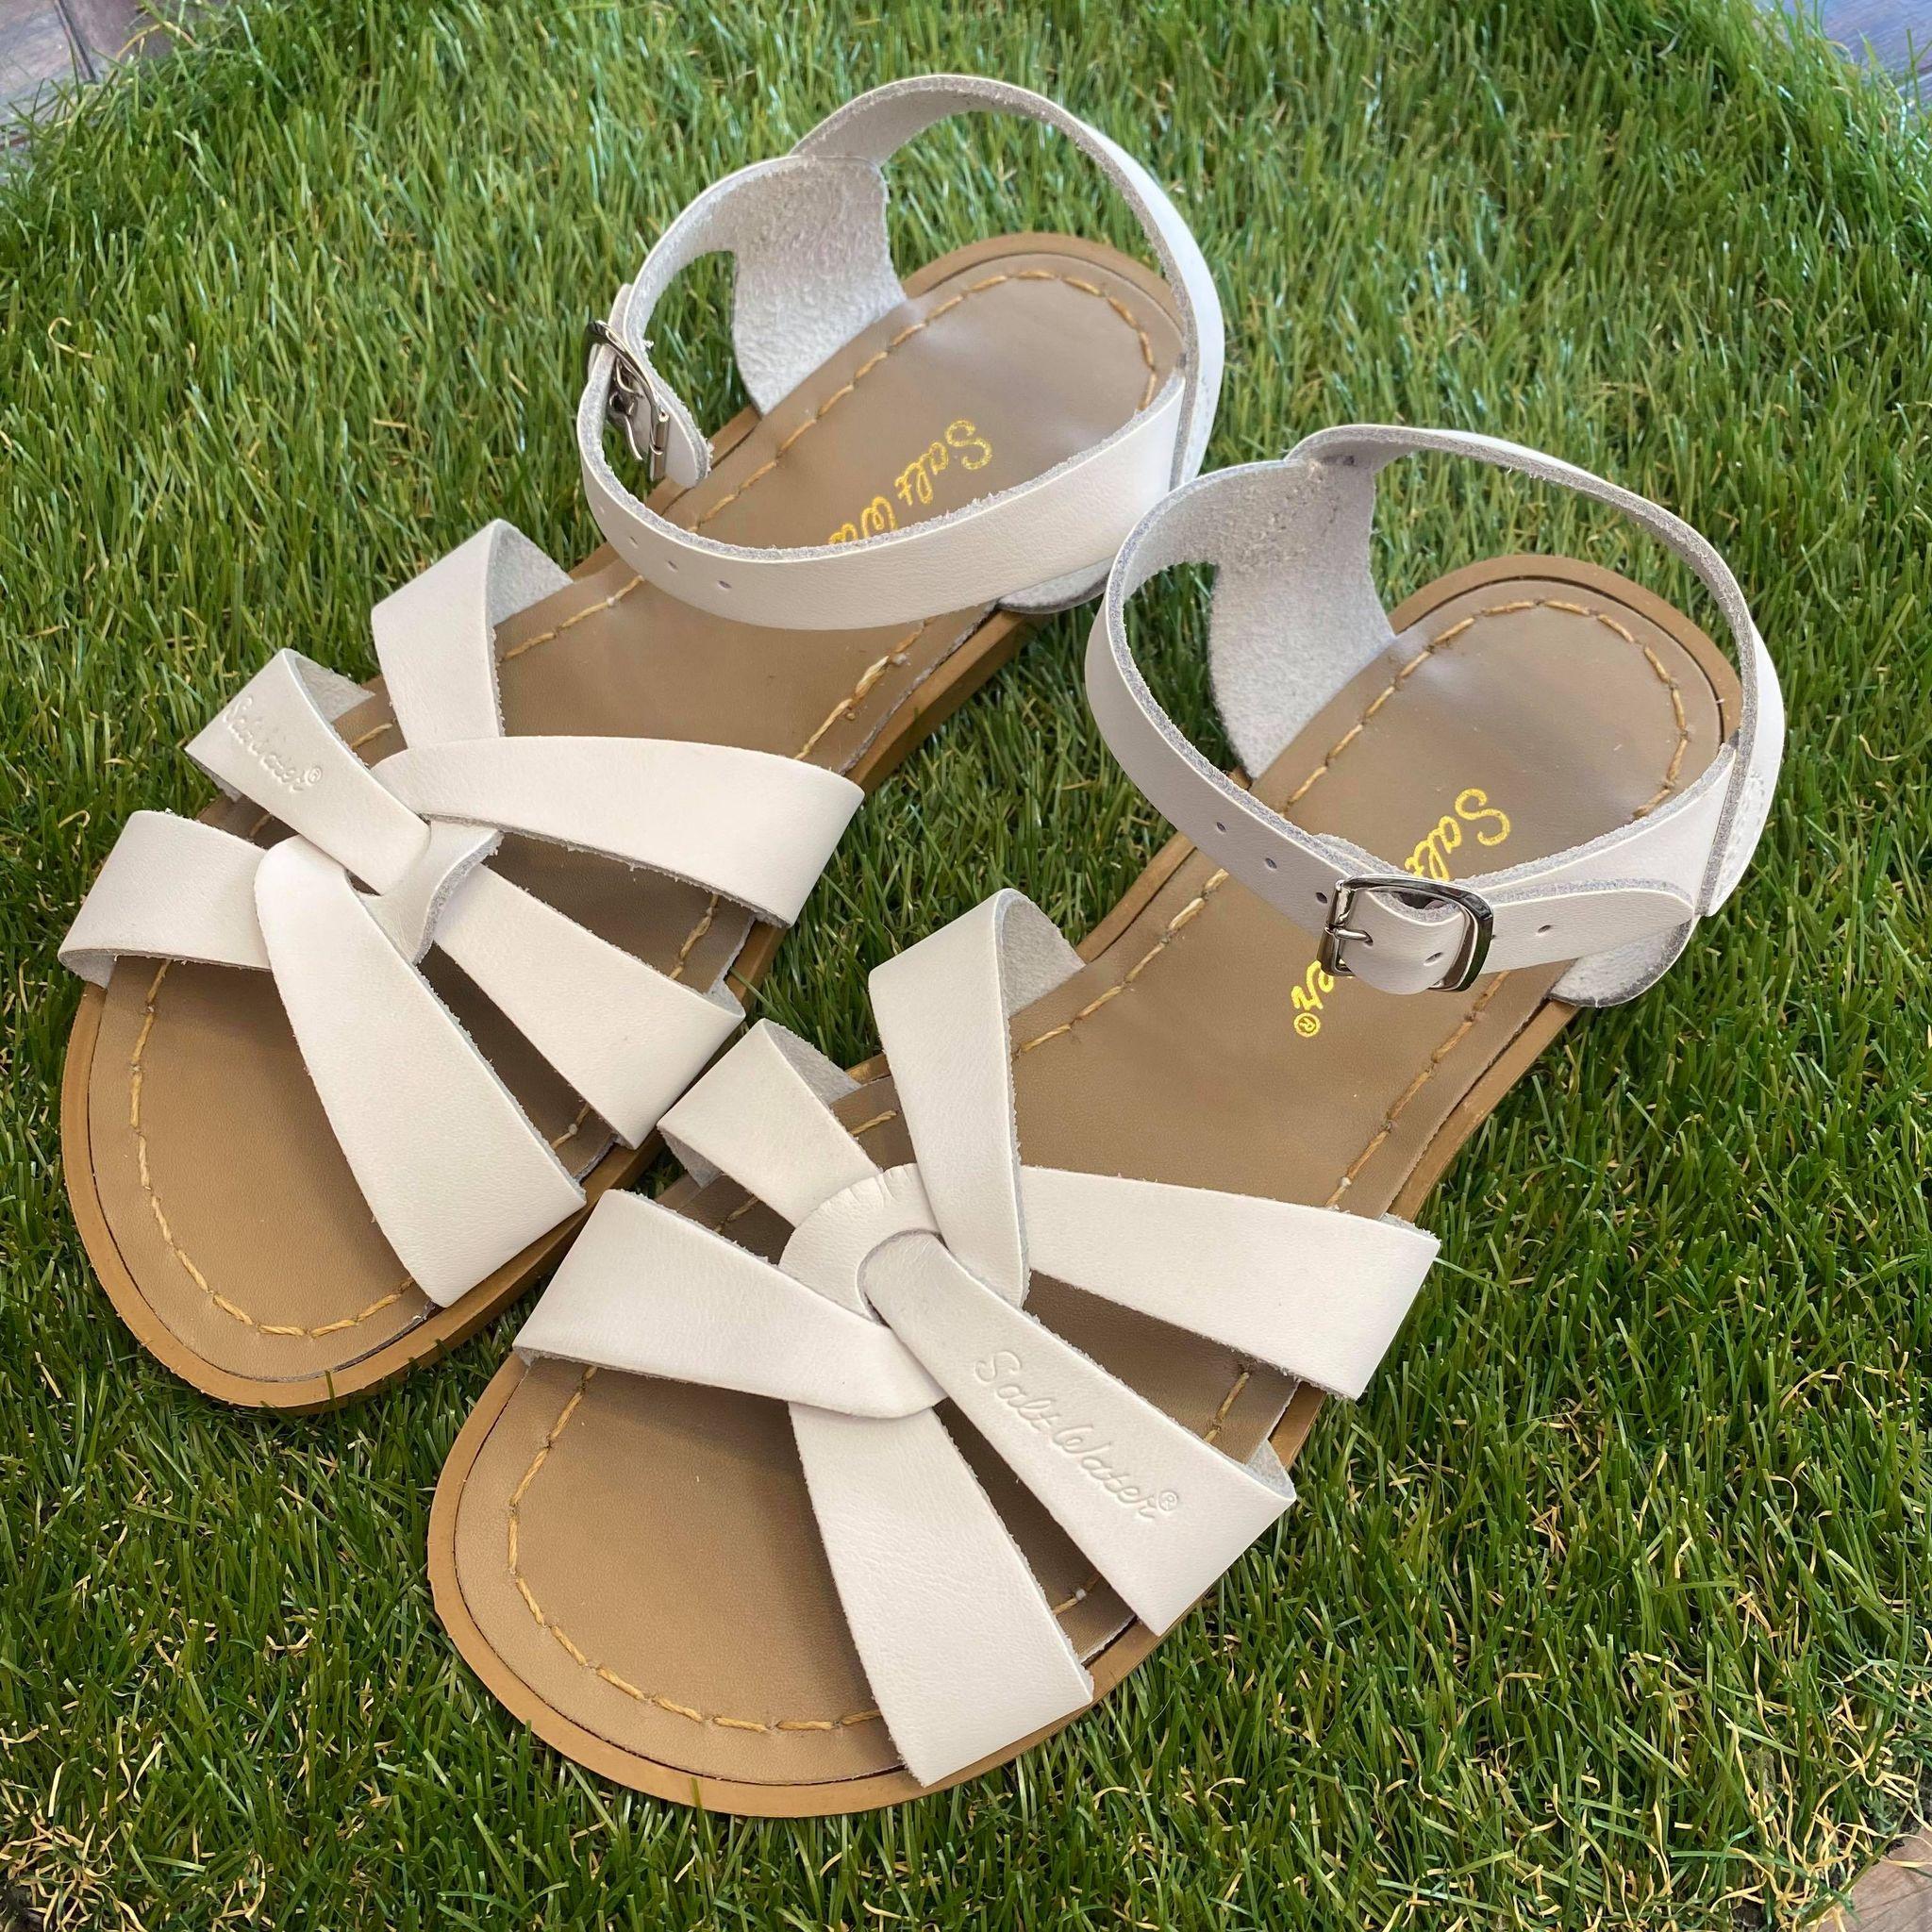 【Salt Water Sandals(ソルトウォーターサンダル)】Adults・The Original/White/22.9cm~25.1cm